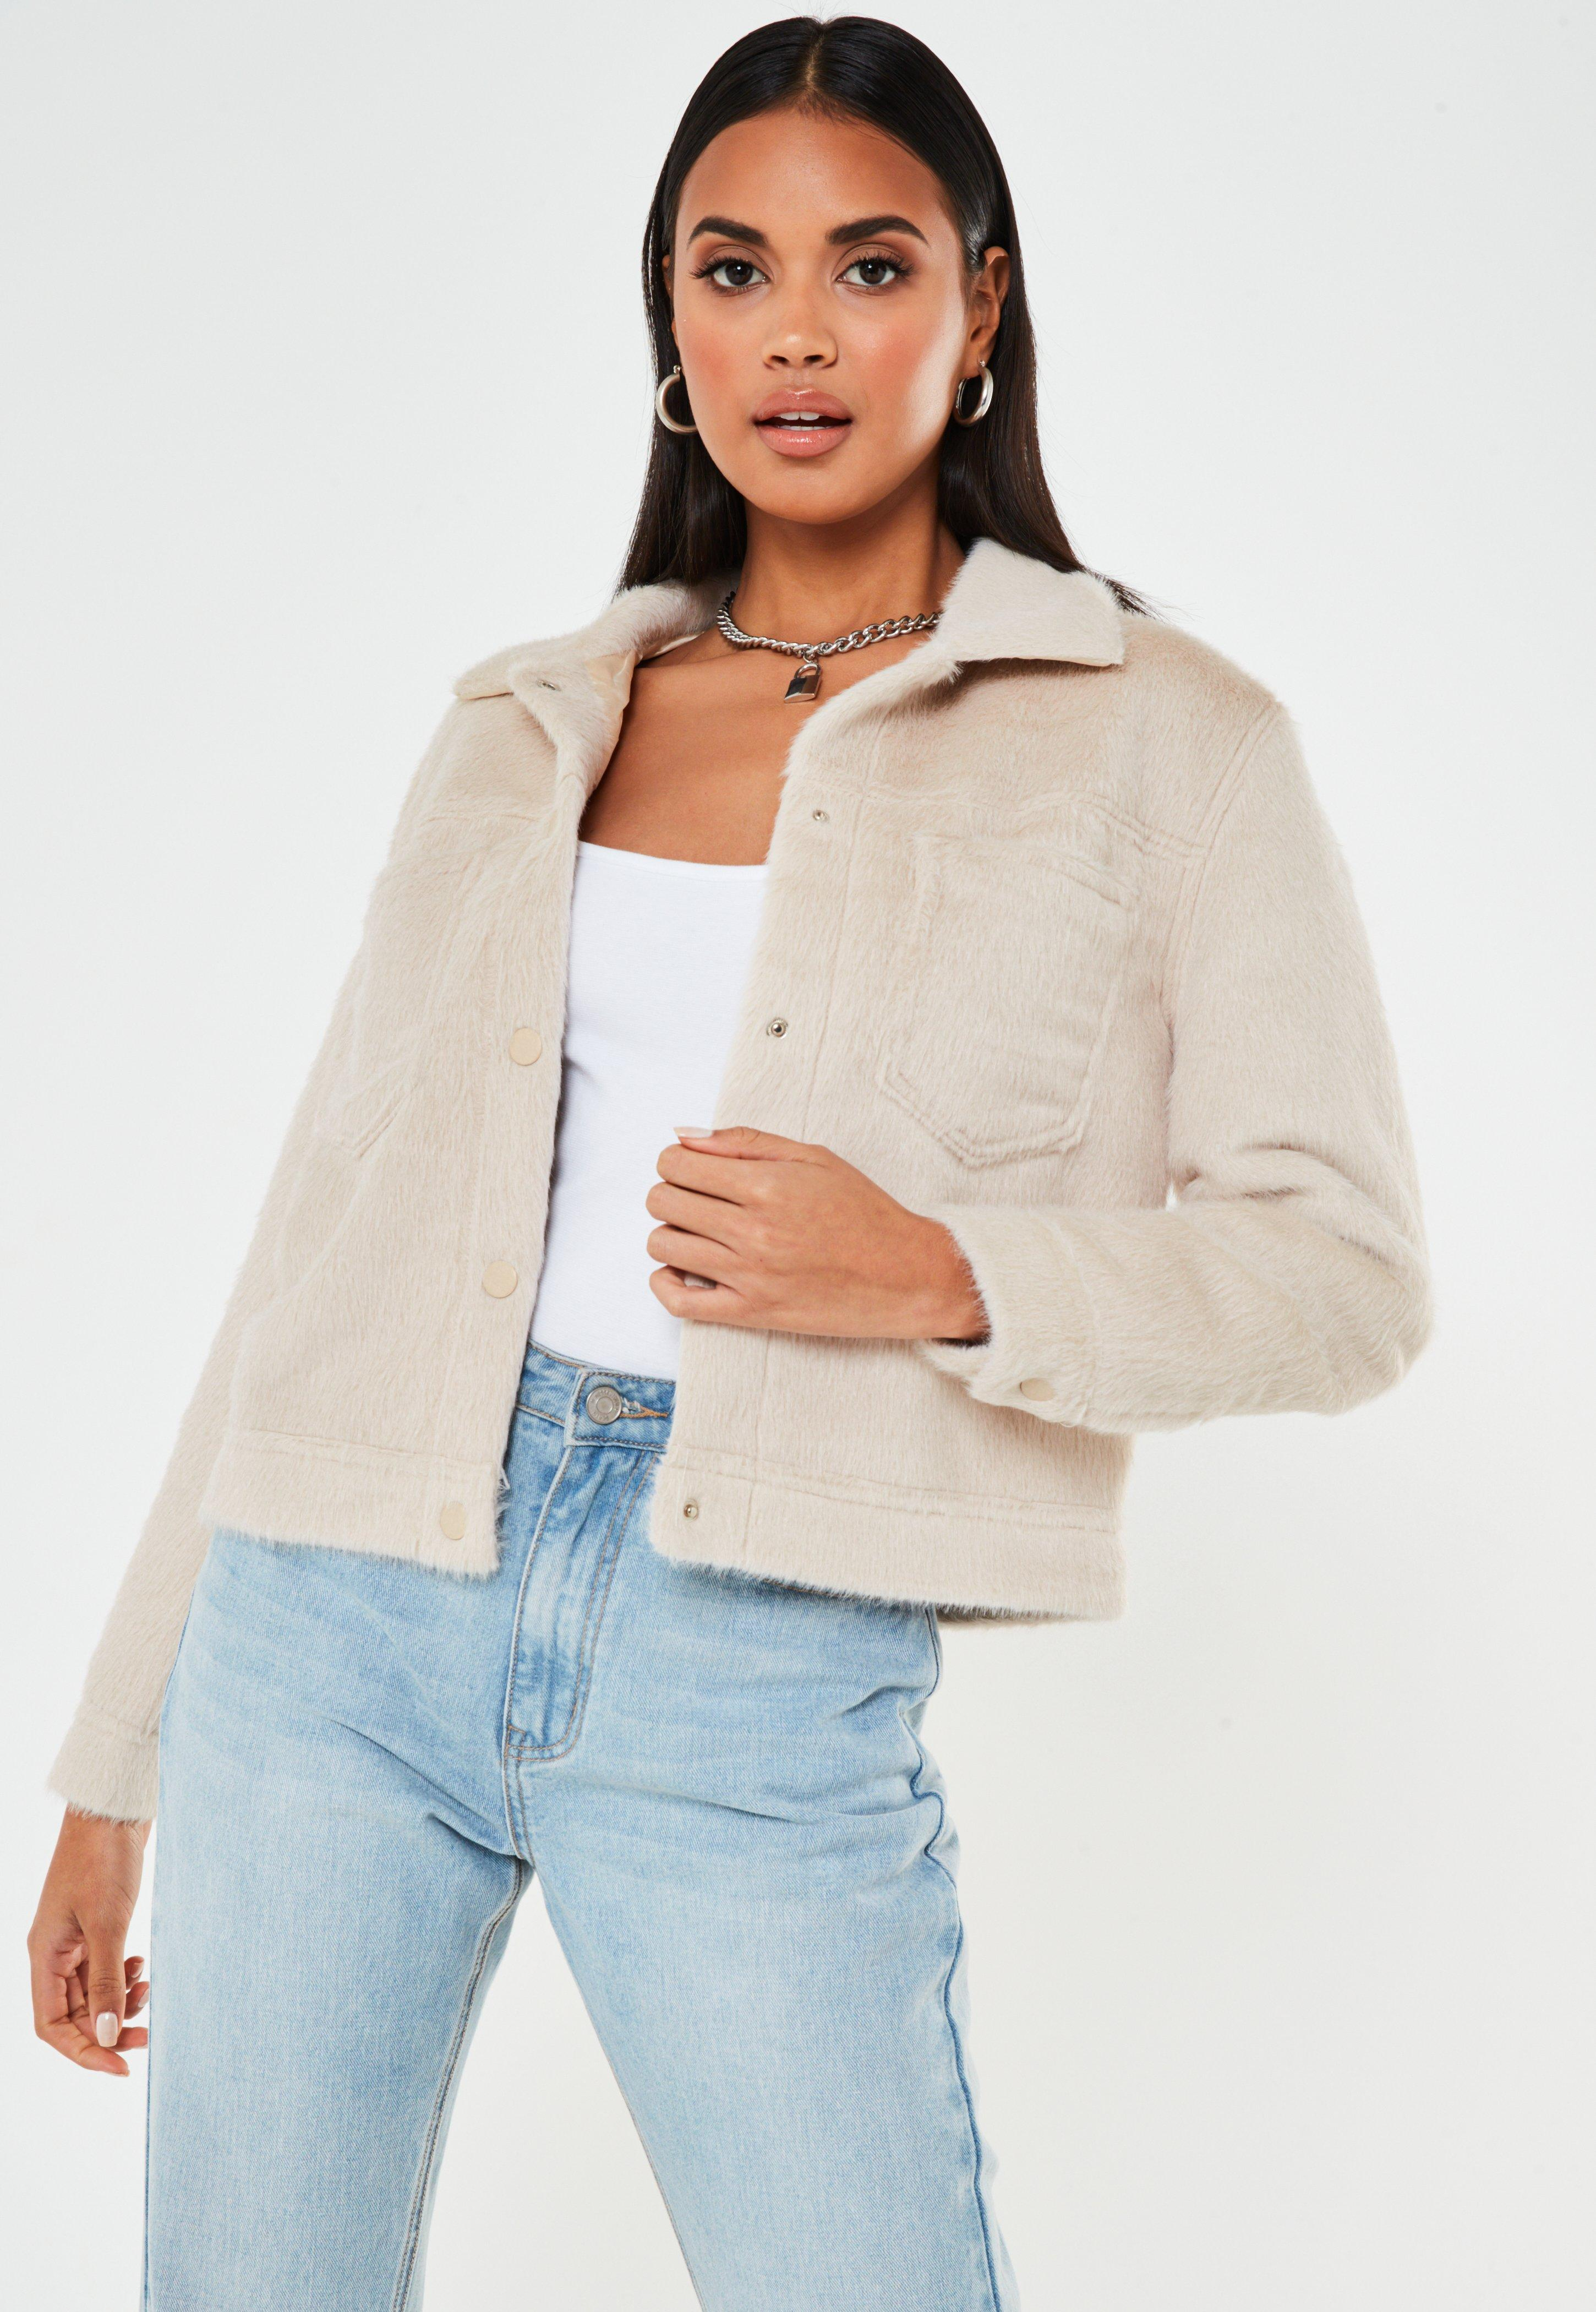 81a15b65576d1 Coats & Jackets | Women's Coats Online UK - Missguided